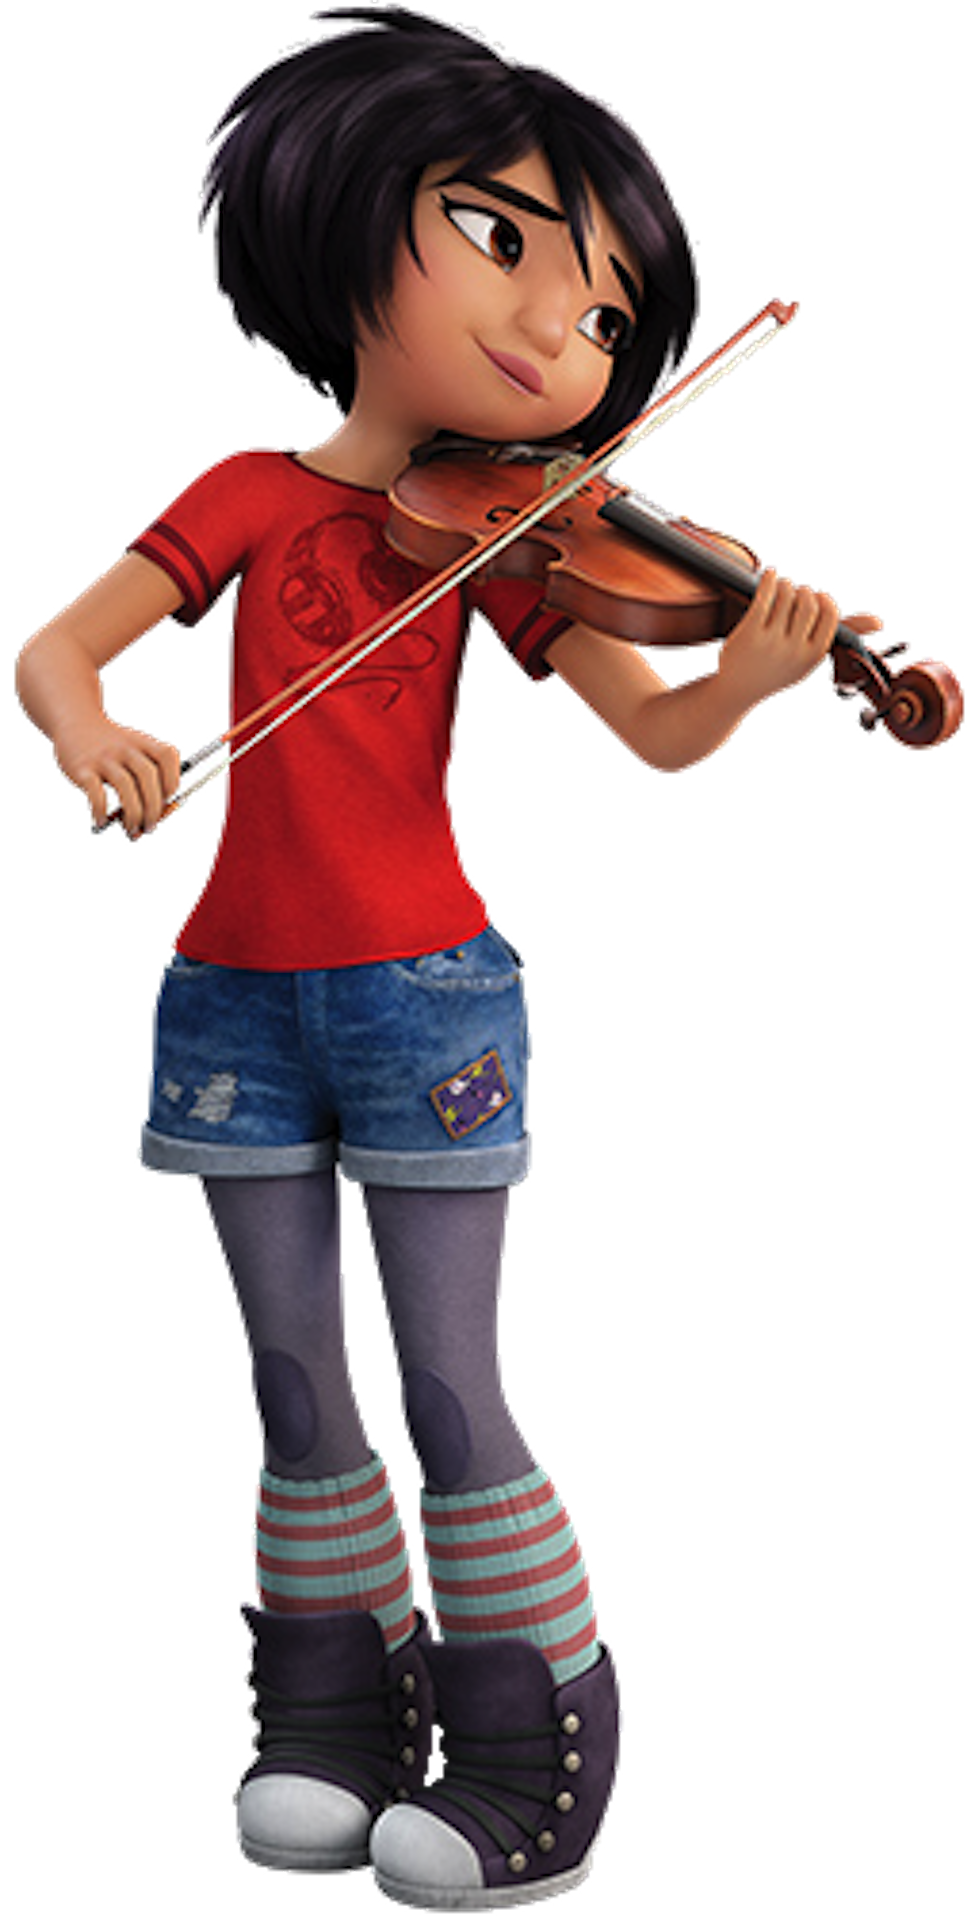 Yi Dreamworks Animation Wiki Fandom in 2020